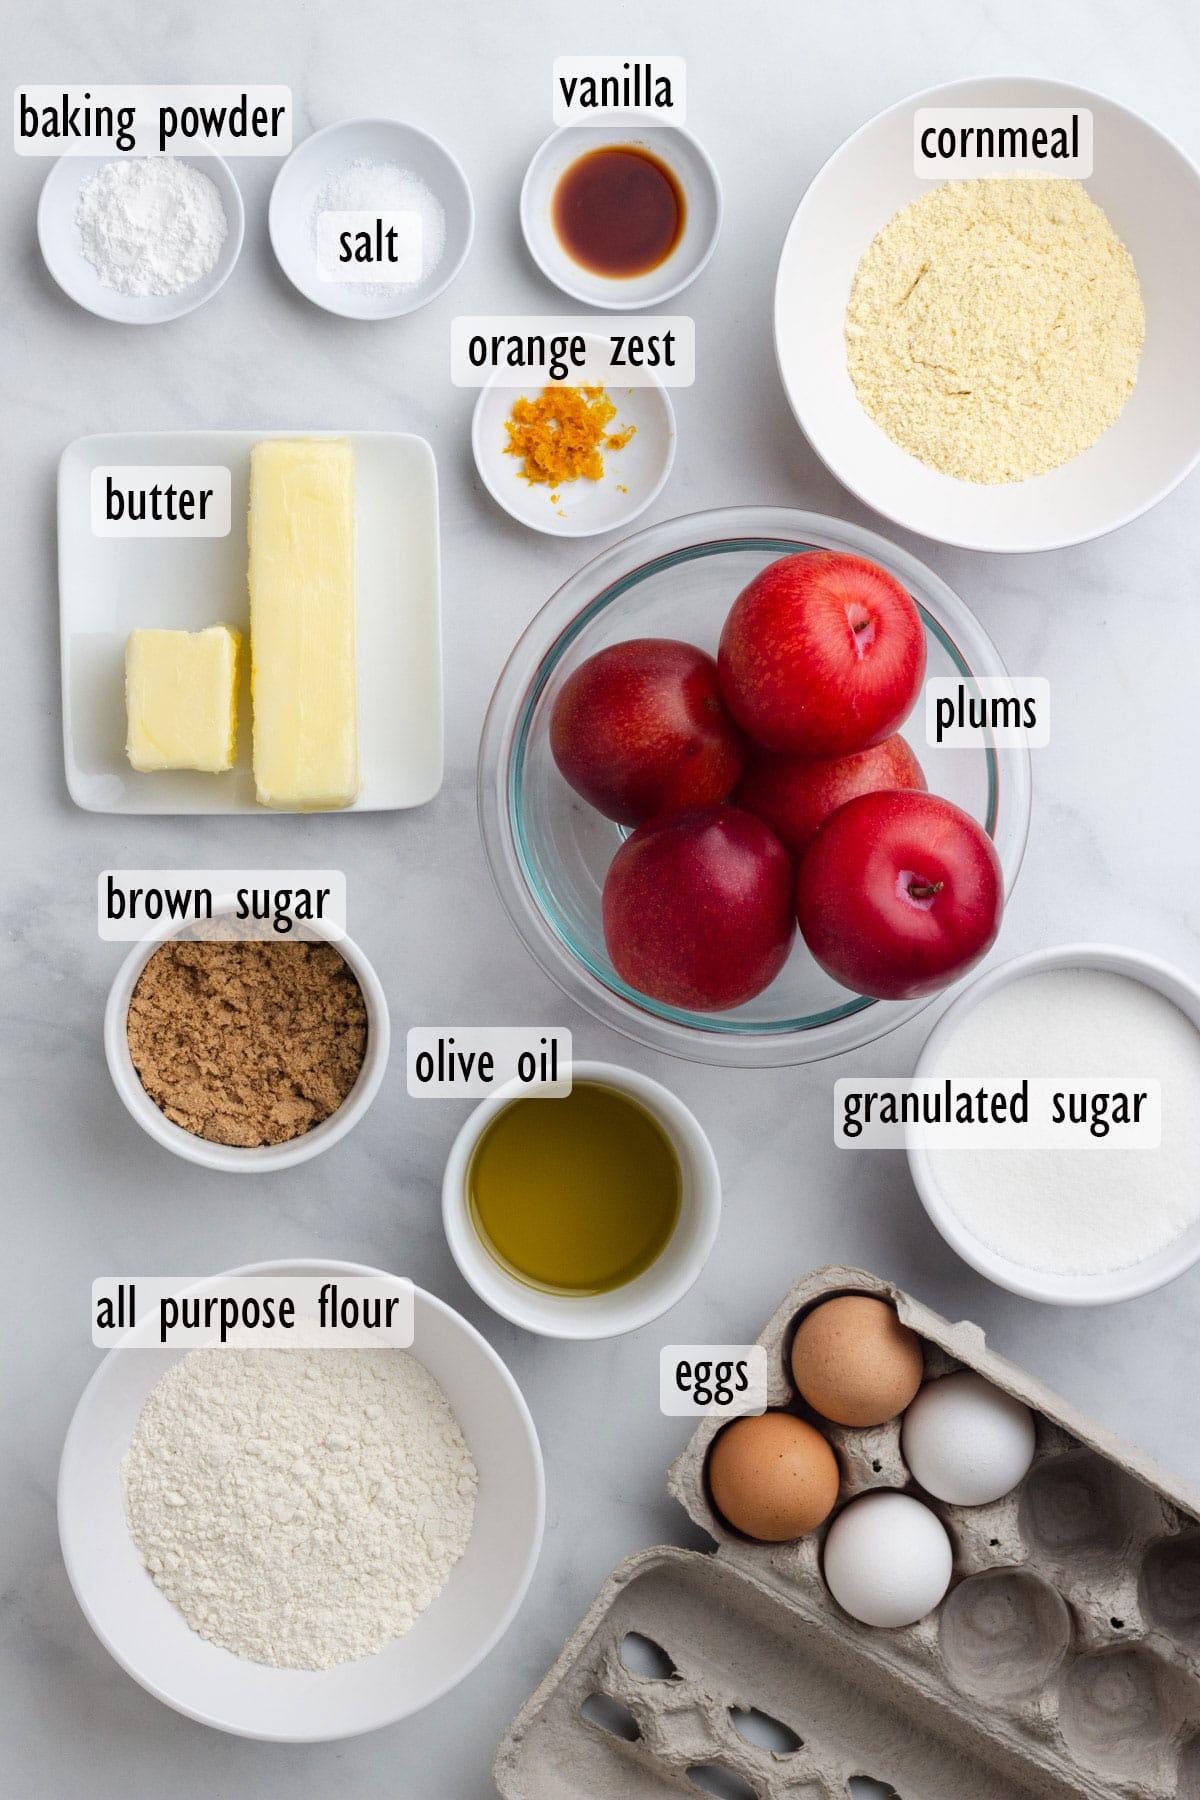 Cake Ingredients, including red plums, eggs, cornmeal, flour, white sugar, brown sugar, butter, olive oil, baking powder, salt, vanilla and orange zest.